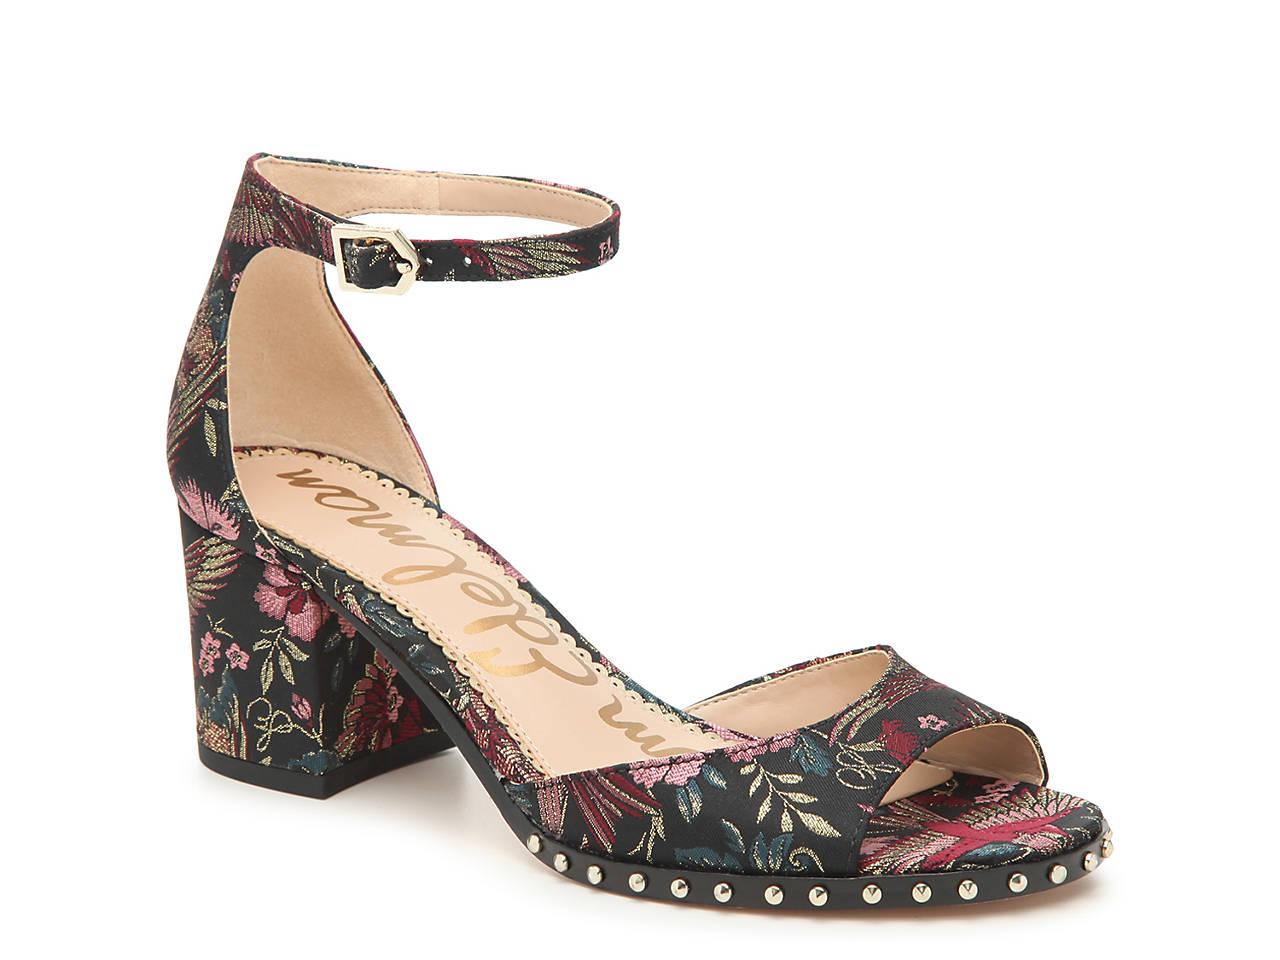 c9ff26837e35 Sam Edelman Susie Sandal Women s Shoes